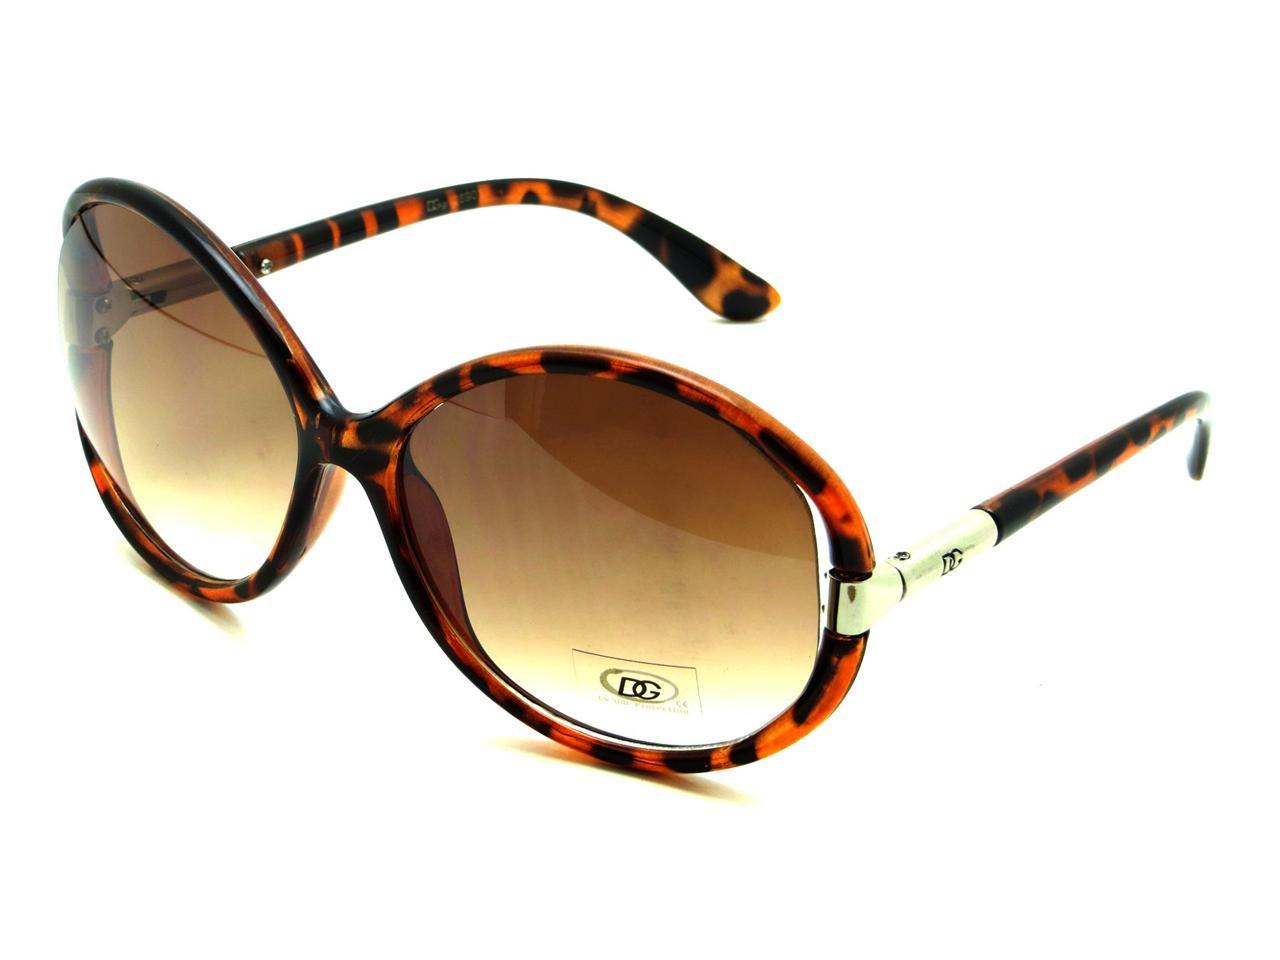 Large womens fashion oversized round circle sunglasses ebay - Dg Women Hippy Round Retro Vintage Hipster Designer